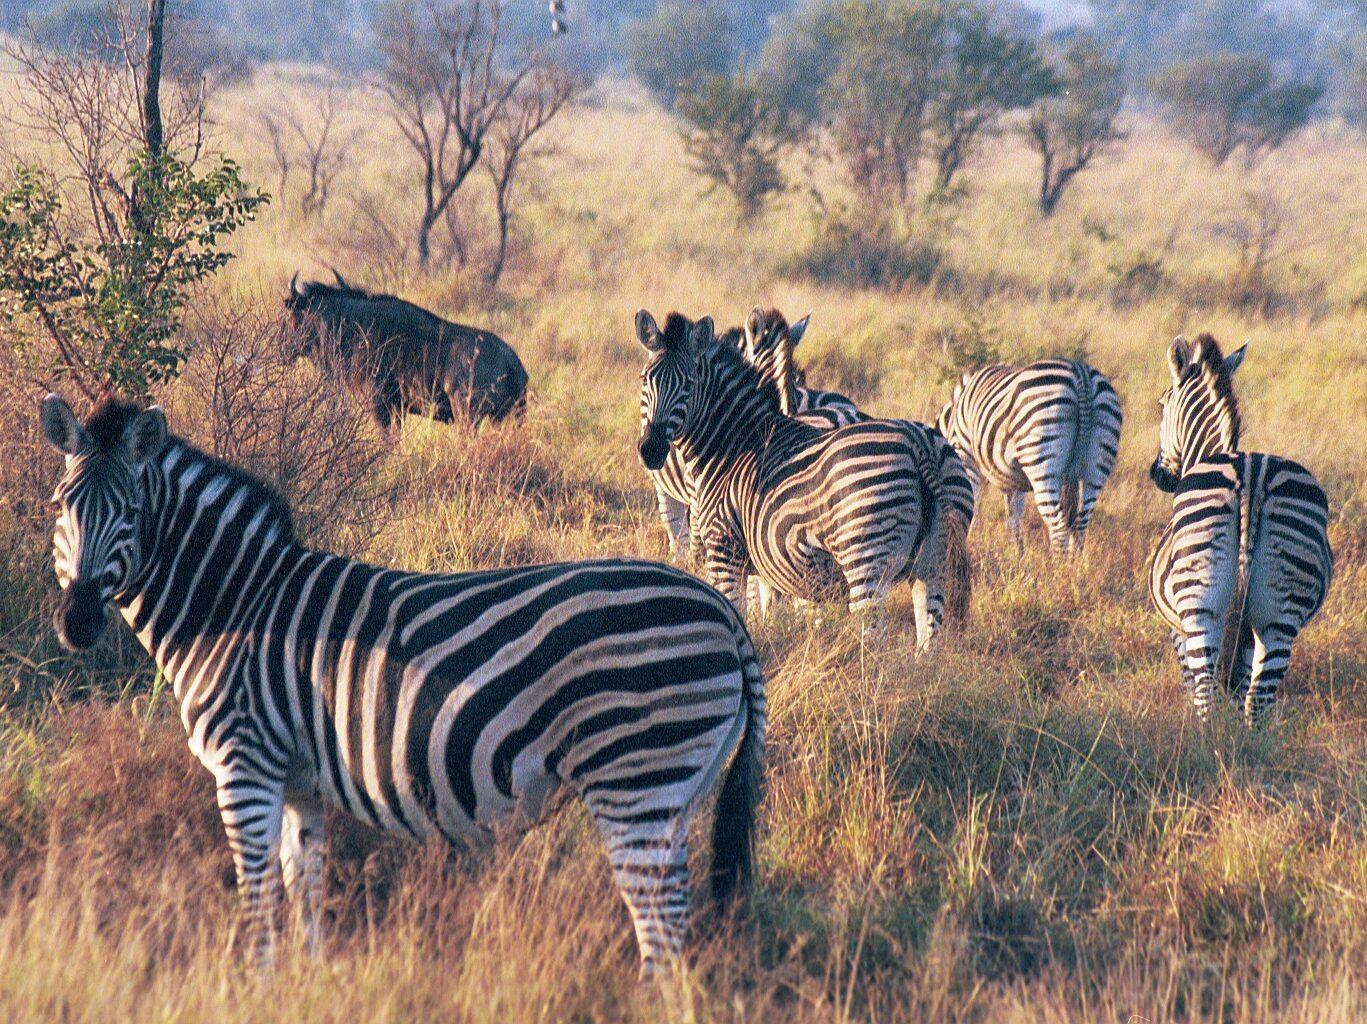 Zebras-South Africa